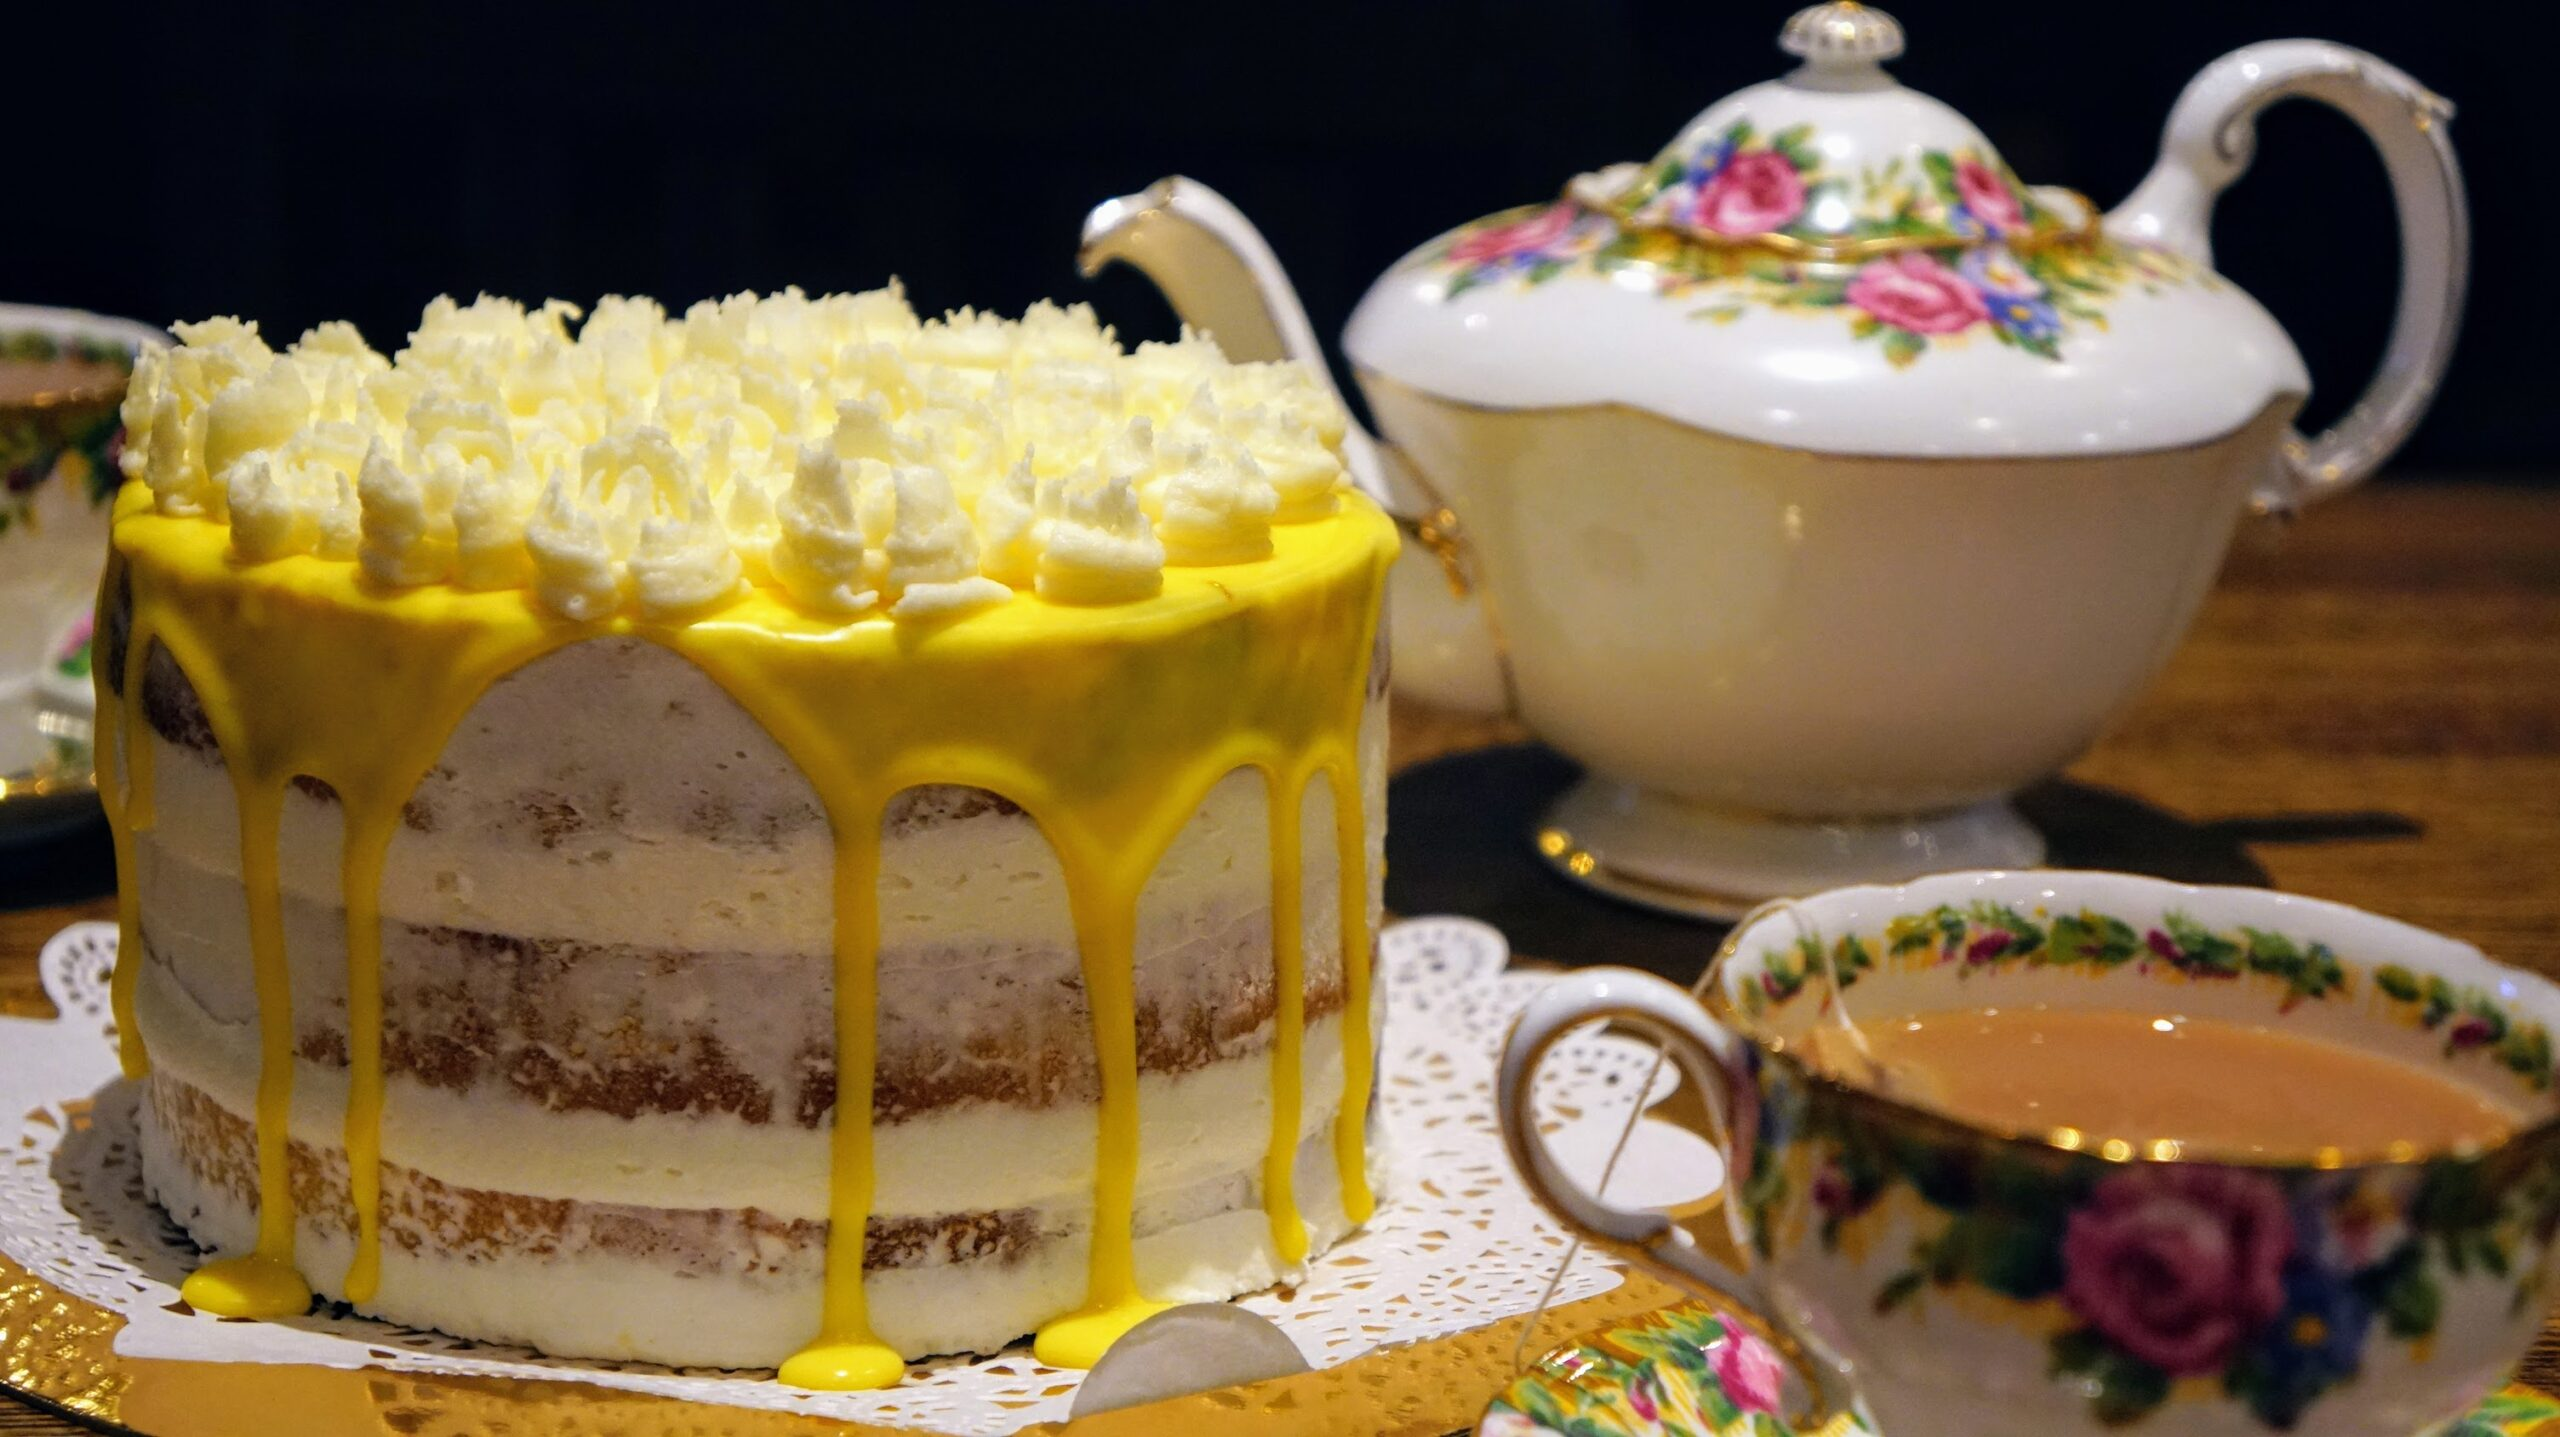 Taste the Royal Wedding Cake in Alberta